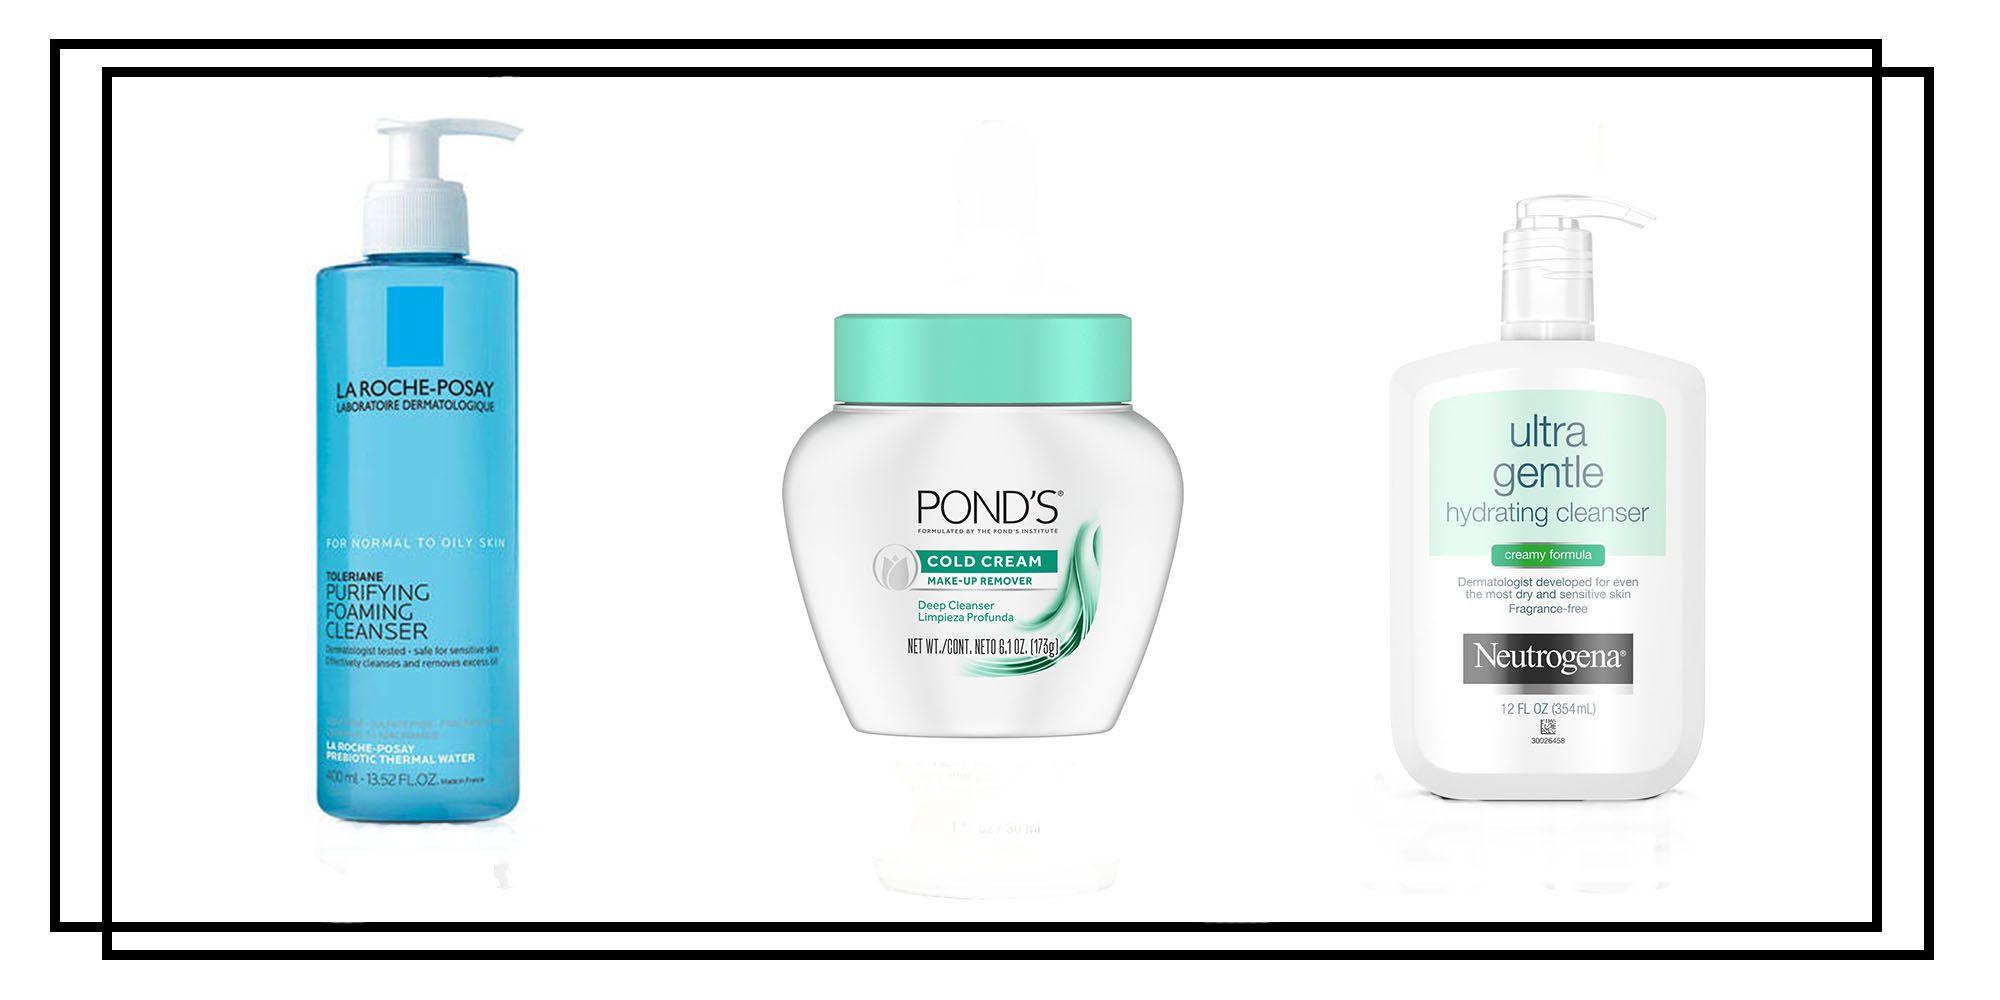 Dermatologist facial cleanser